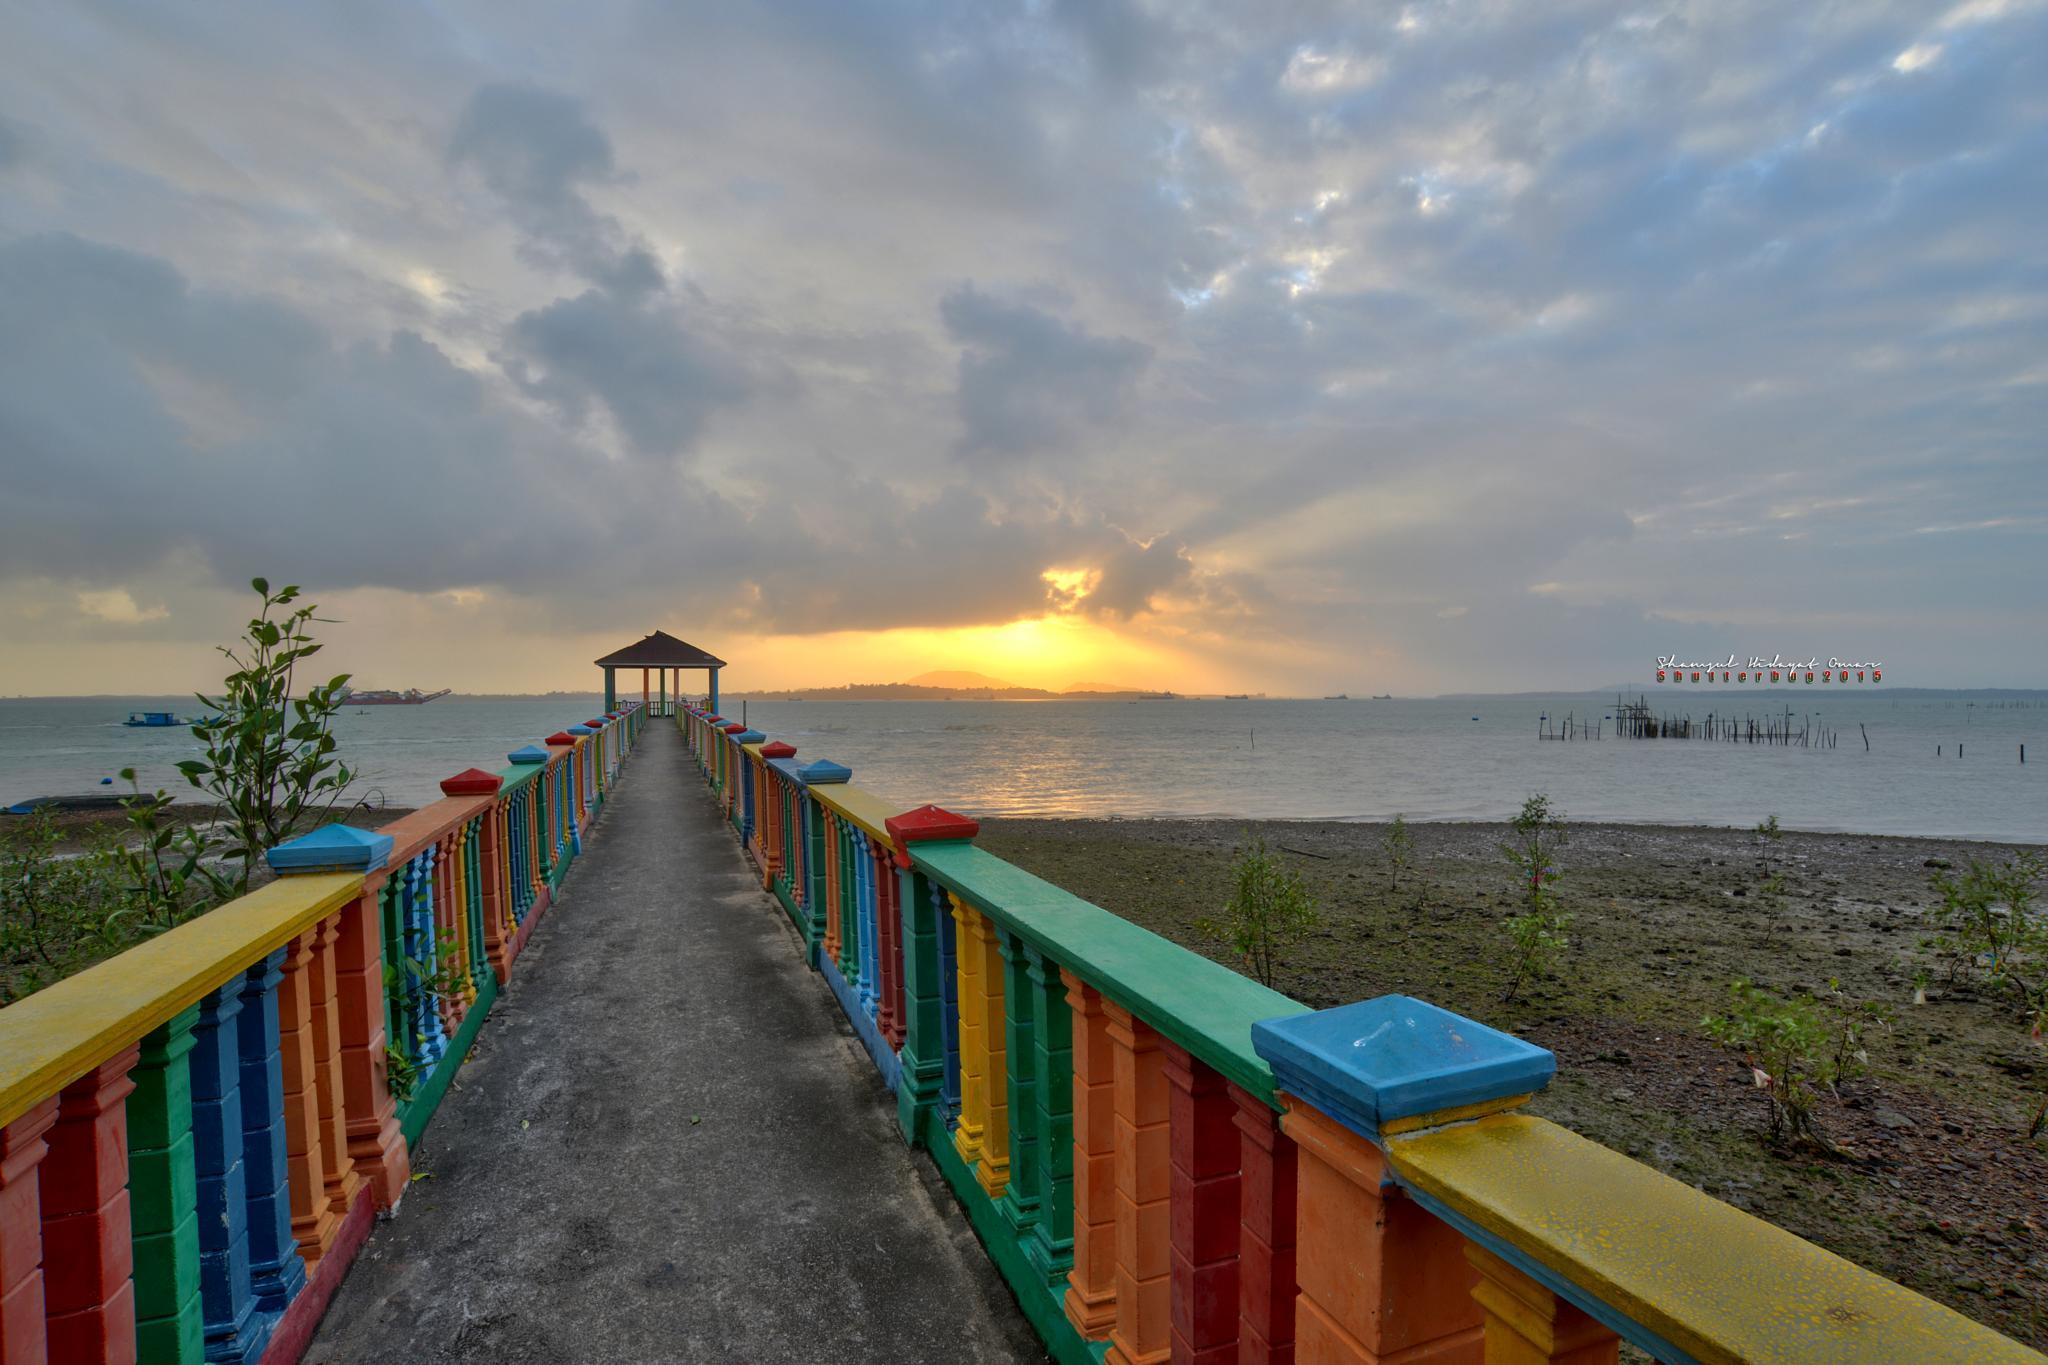 Tanjung Langsat | Scene 1 by ShamsulHidayatOmar